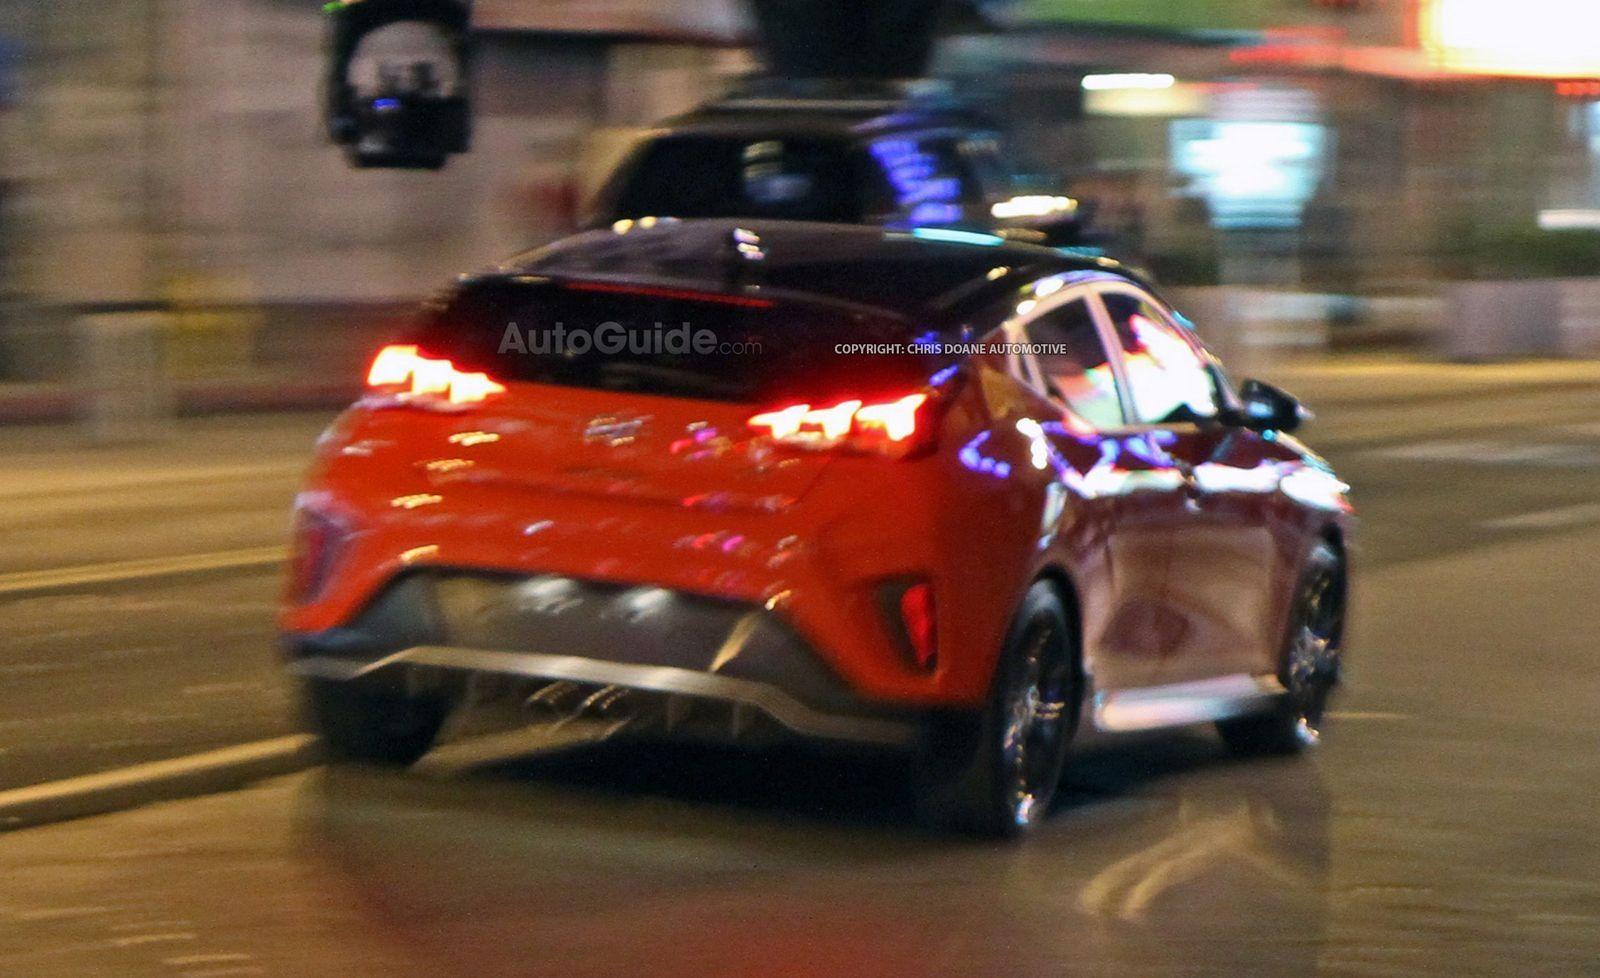 Best 2020 Hyundai Veloster Specs Car Price 2019 Hyundai Veloster Car Prices Car